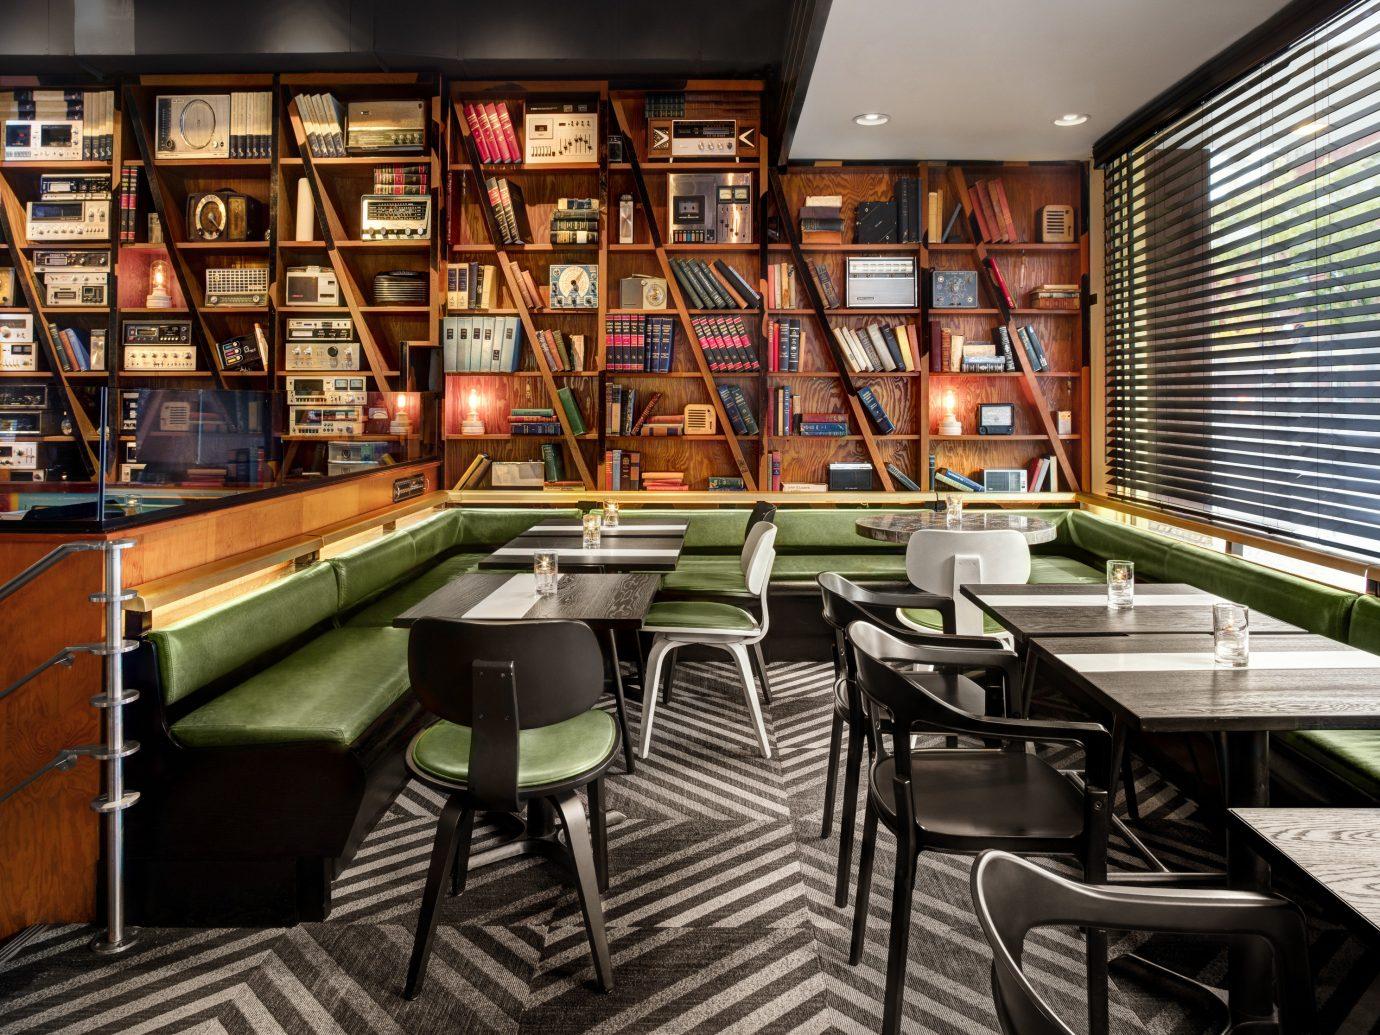 Offbeat Trip Ideas indoor floor table window room ceiling library interior design restaurant Dining furniture